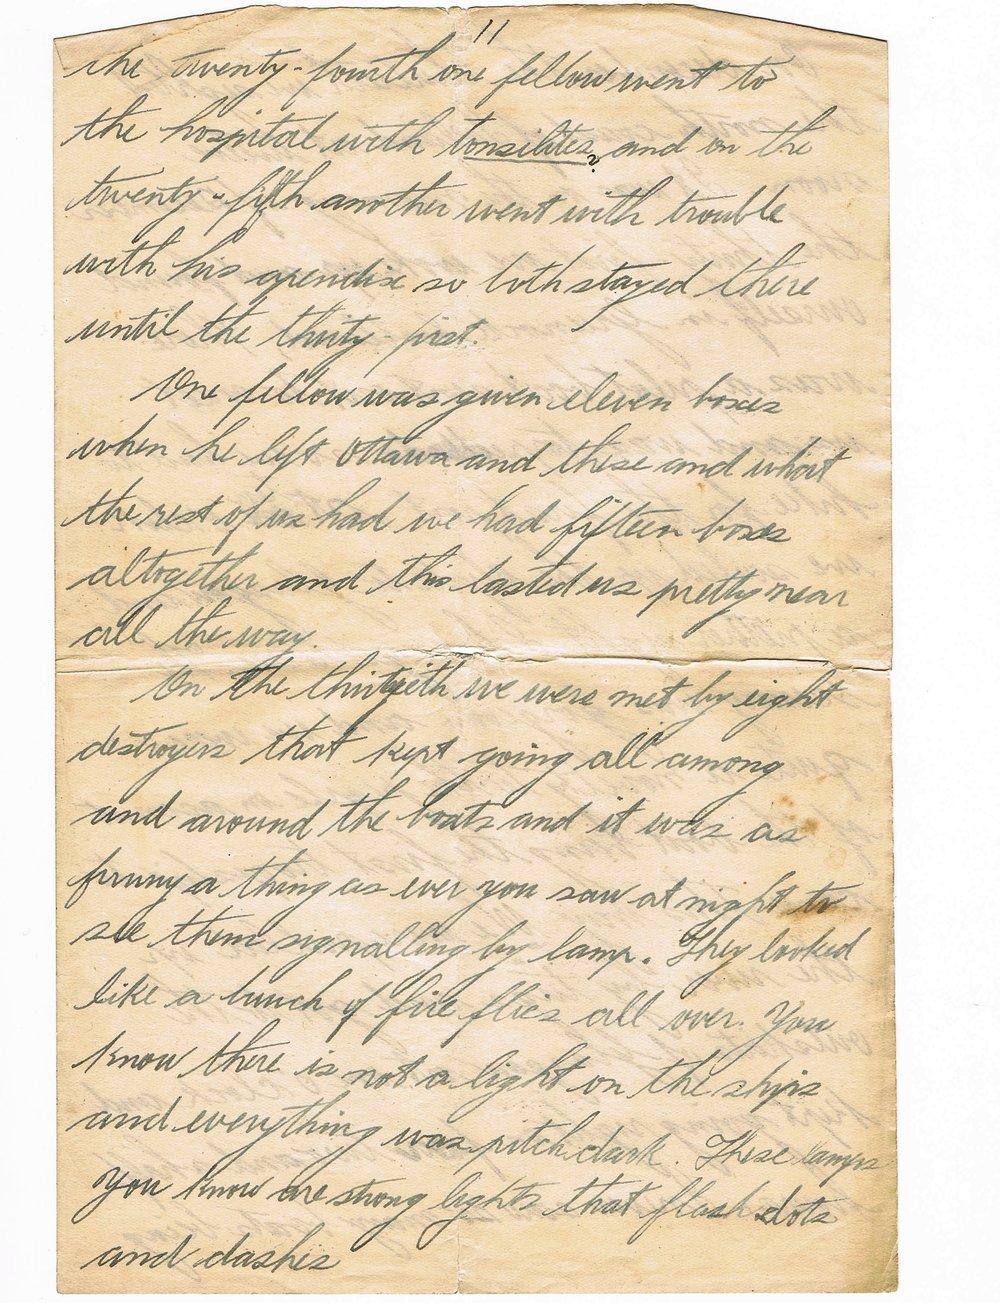 Basil Vale January 2, 1918 letter - page 11.jpg